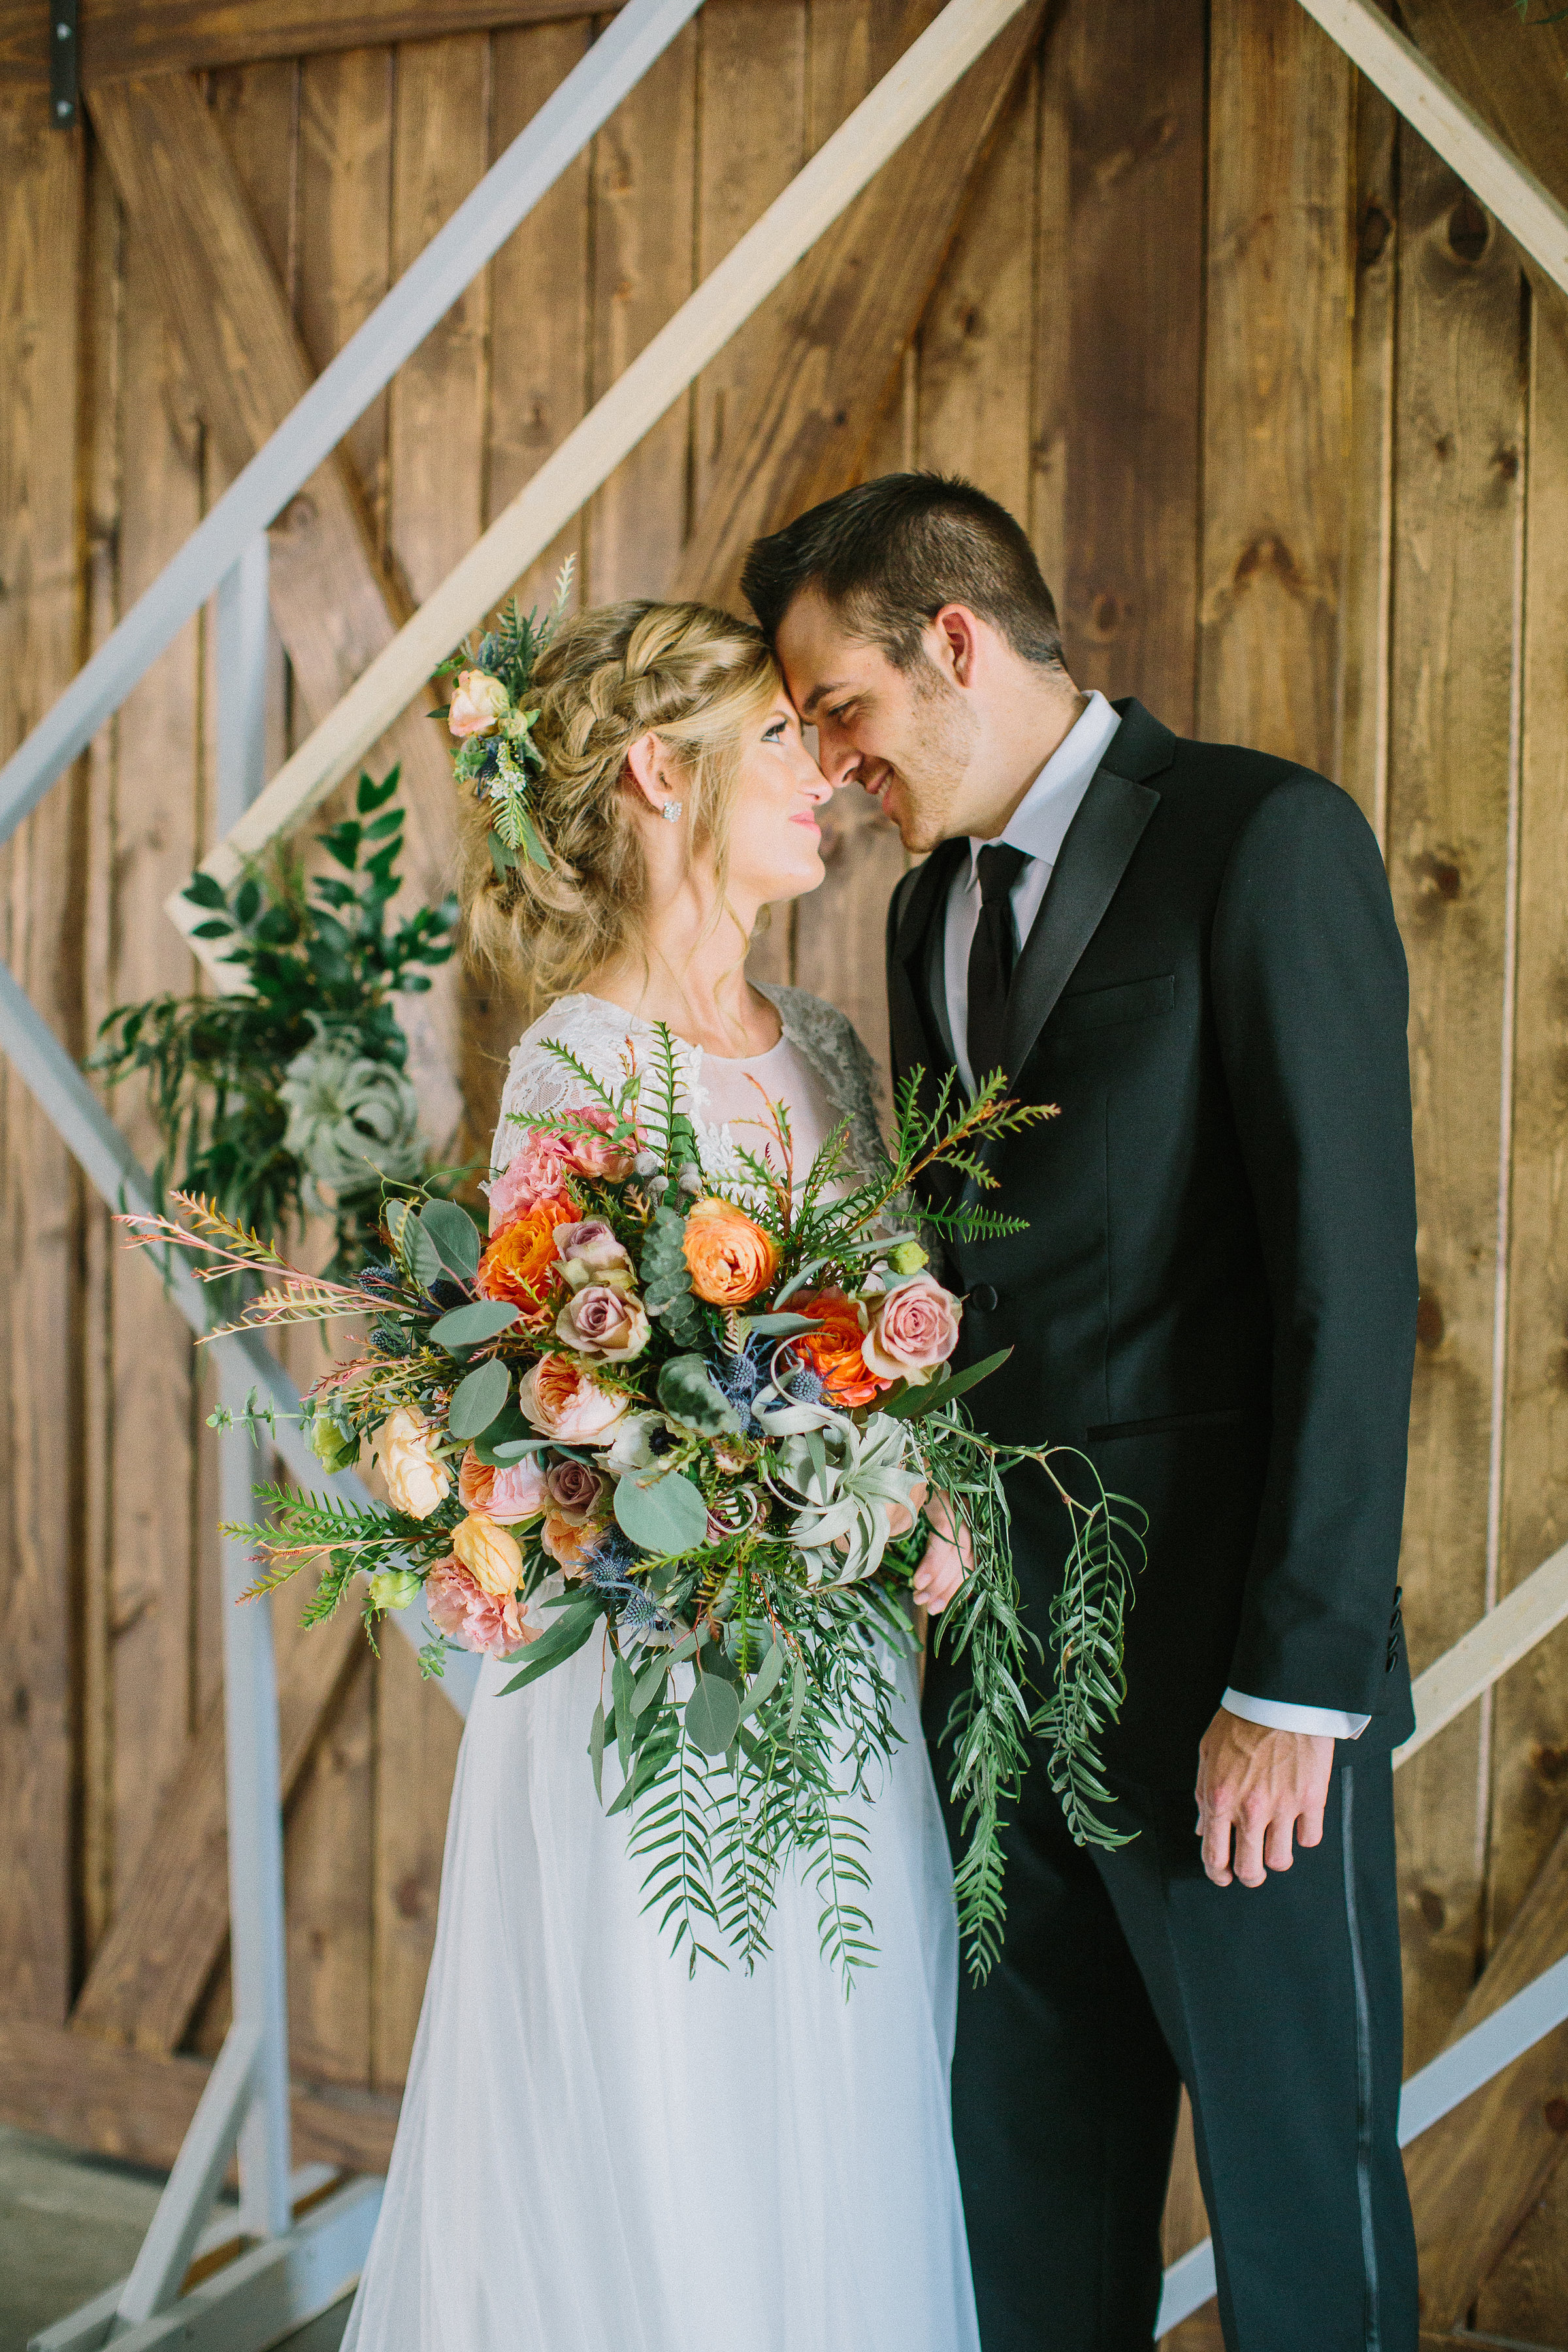 Ellen-Ashton-Photography-Peach-Creek-Ranch-Weddings-Wed-and-Prosper173